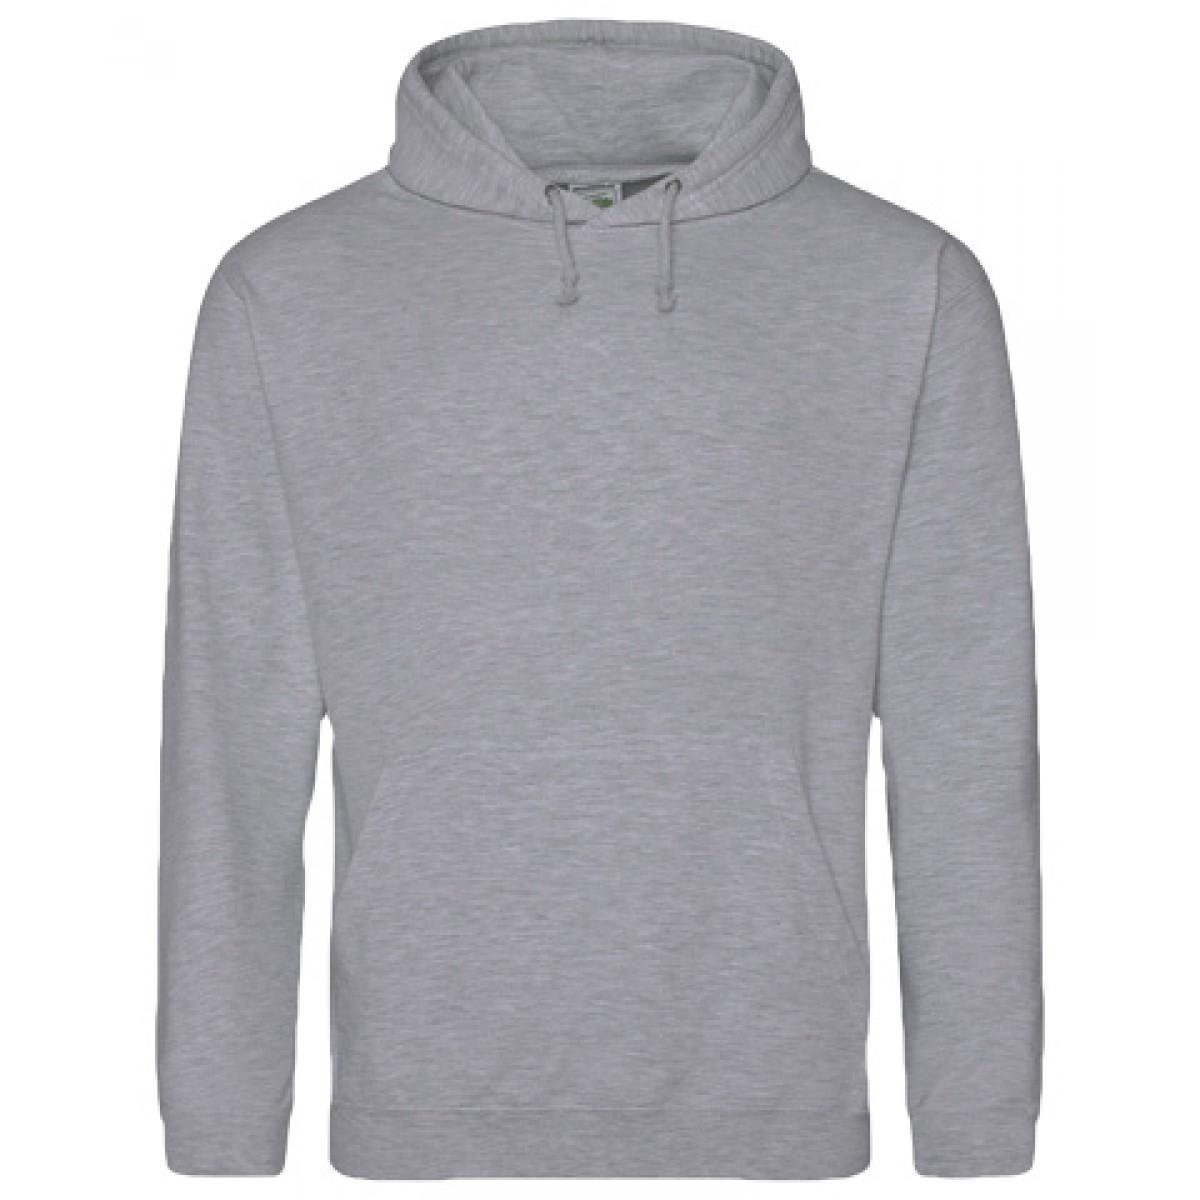 Hooded Sweatshirt 50/50 Heavy Blend-Gray-XL